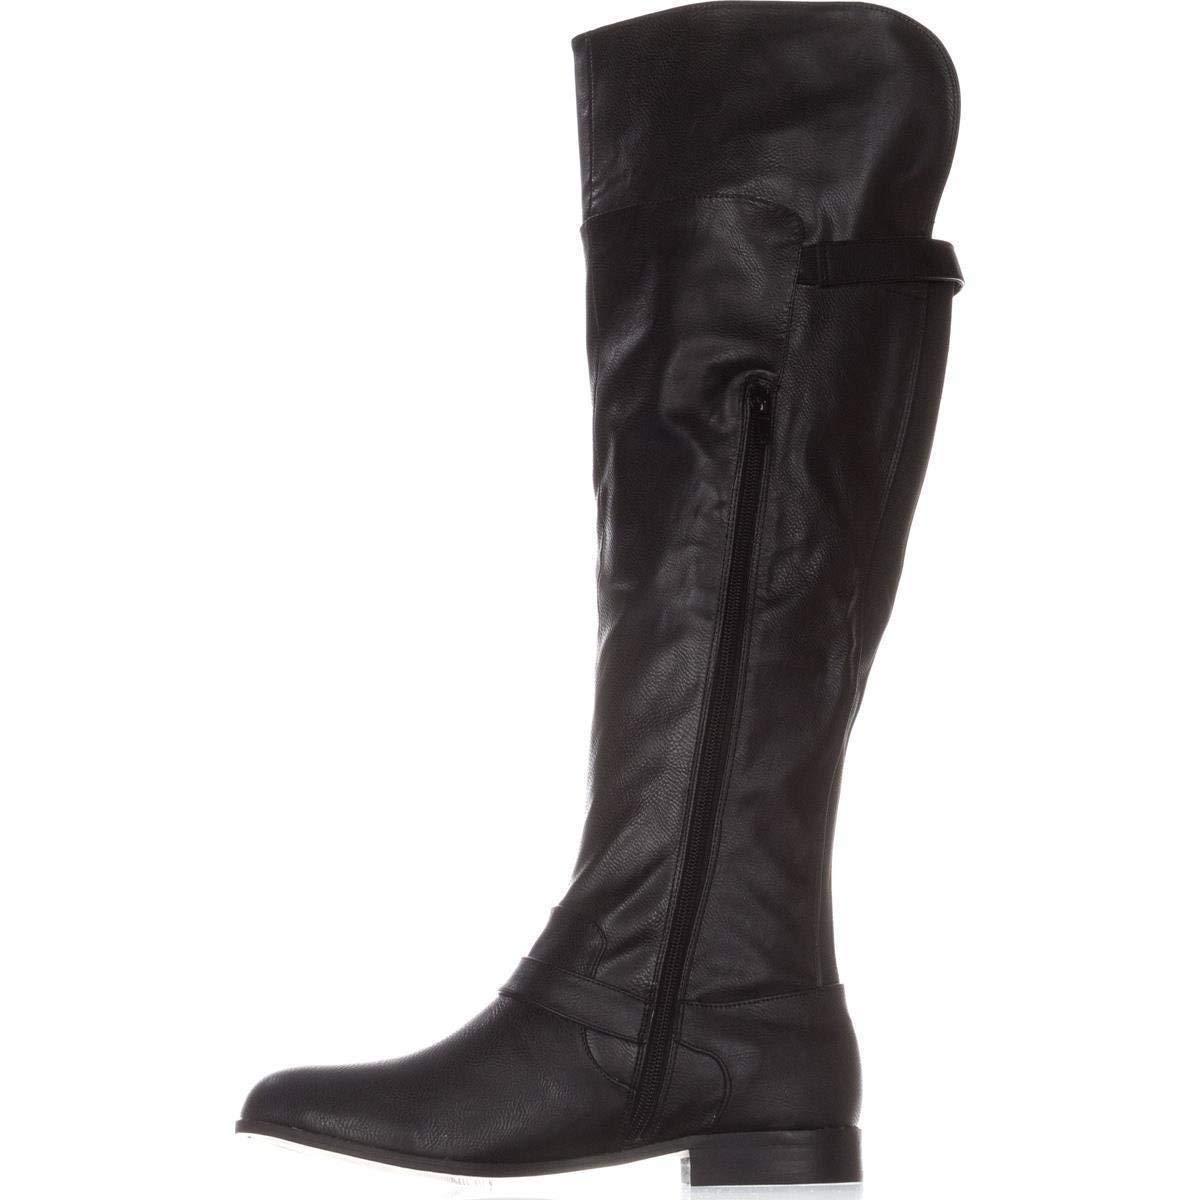 66481dfa52efe Bar III Womens Daphne Closed Toe Knee High Fashion Boots, Black ...